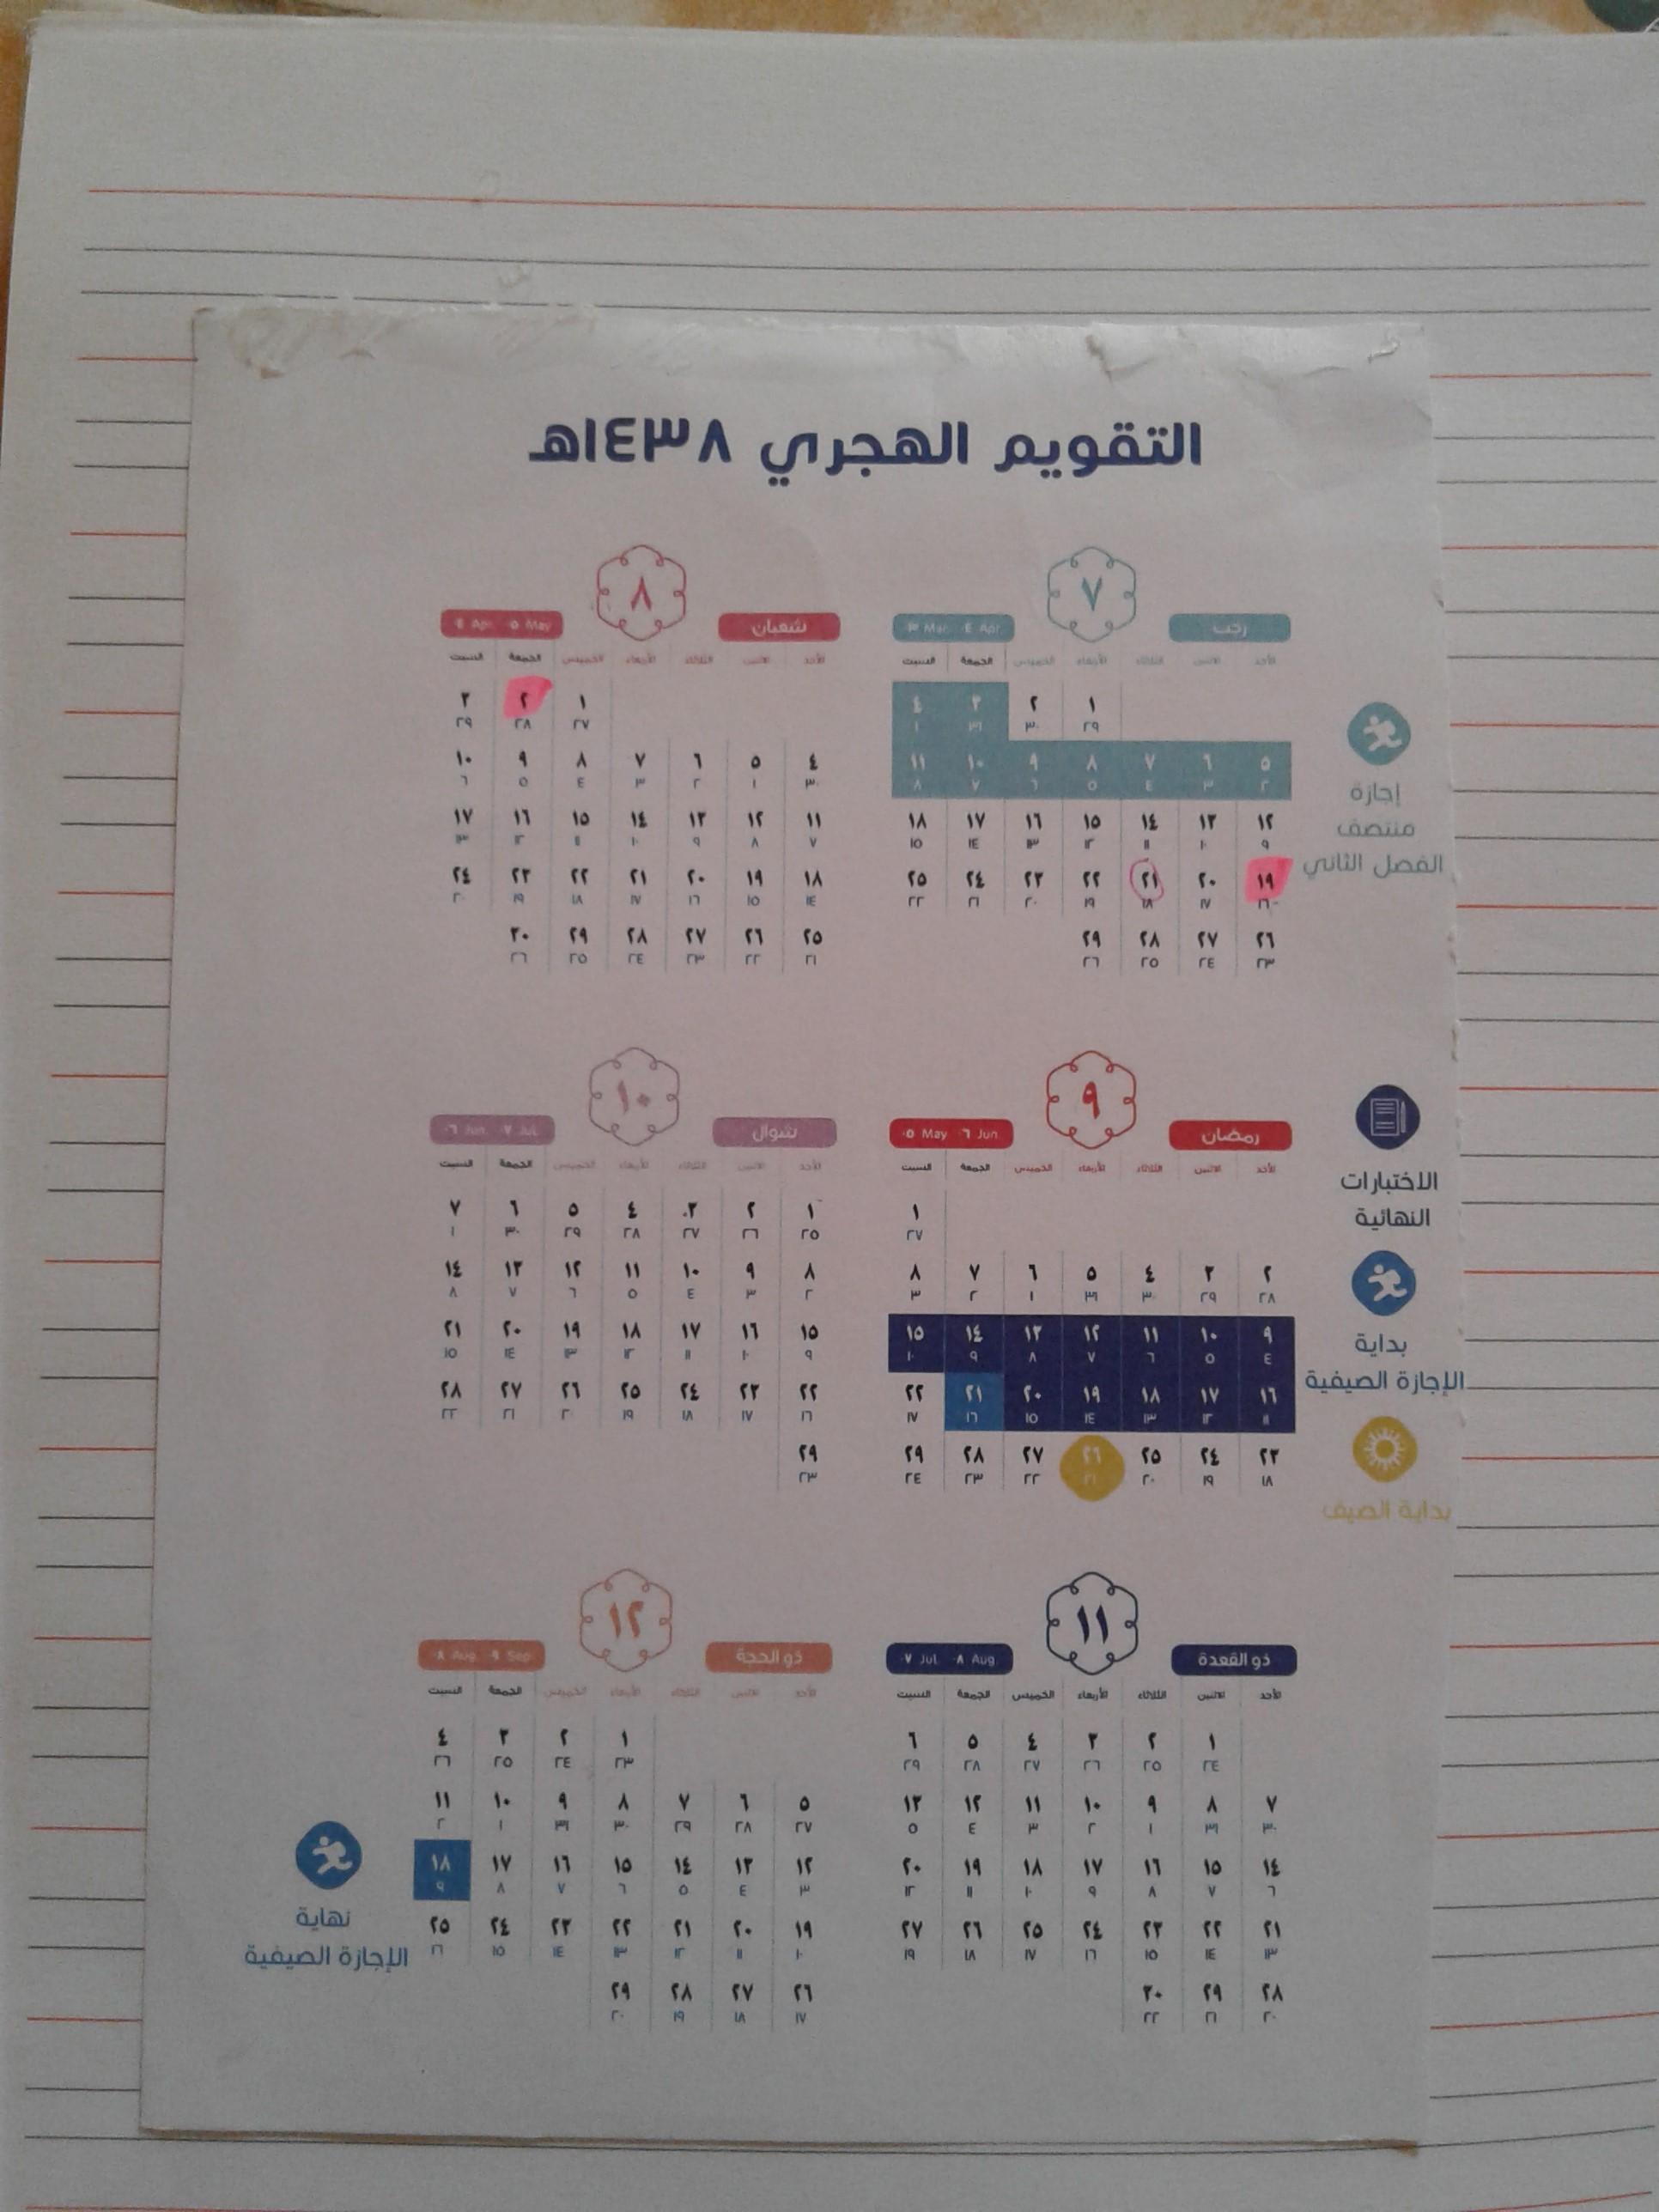 akhawat_islamway_1504360502___.jpg